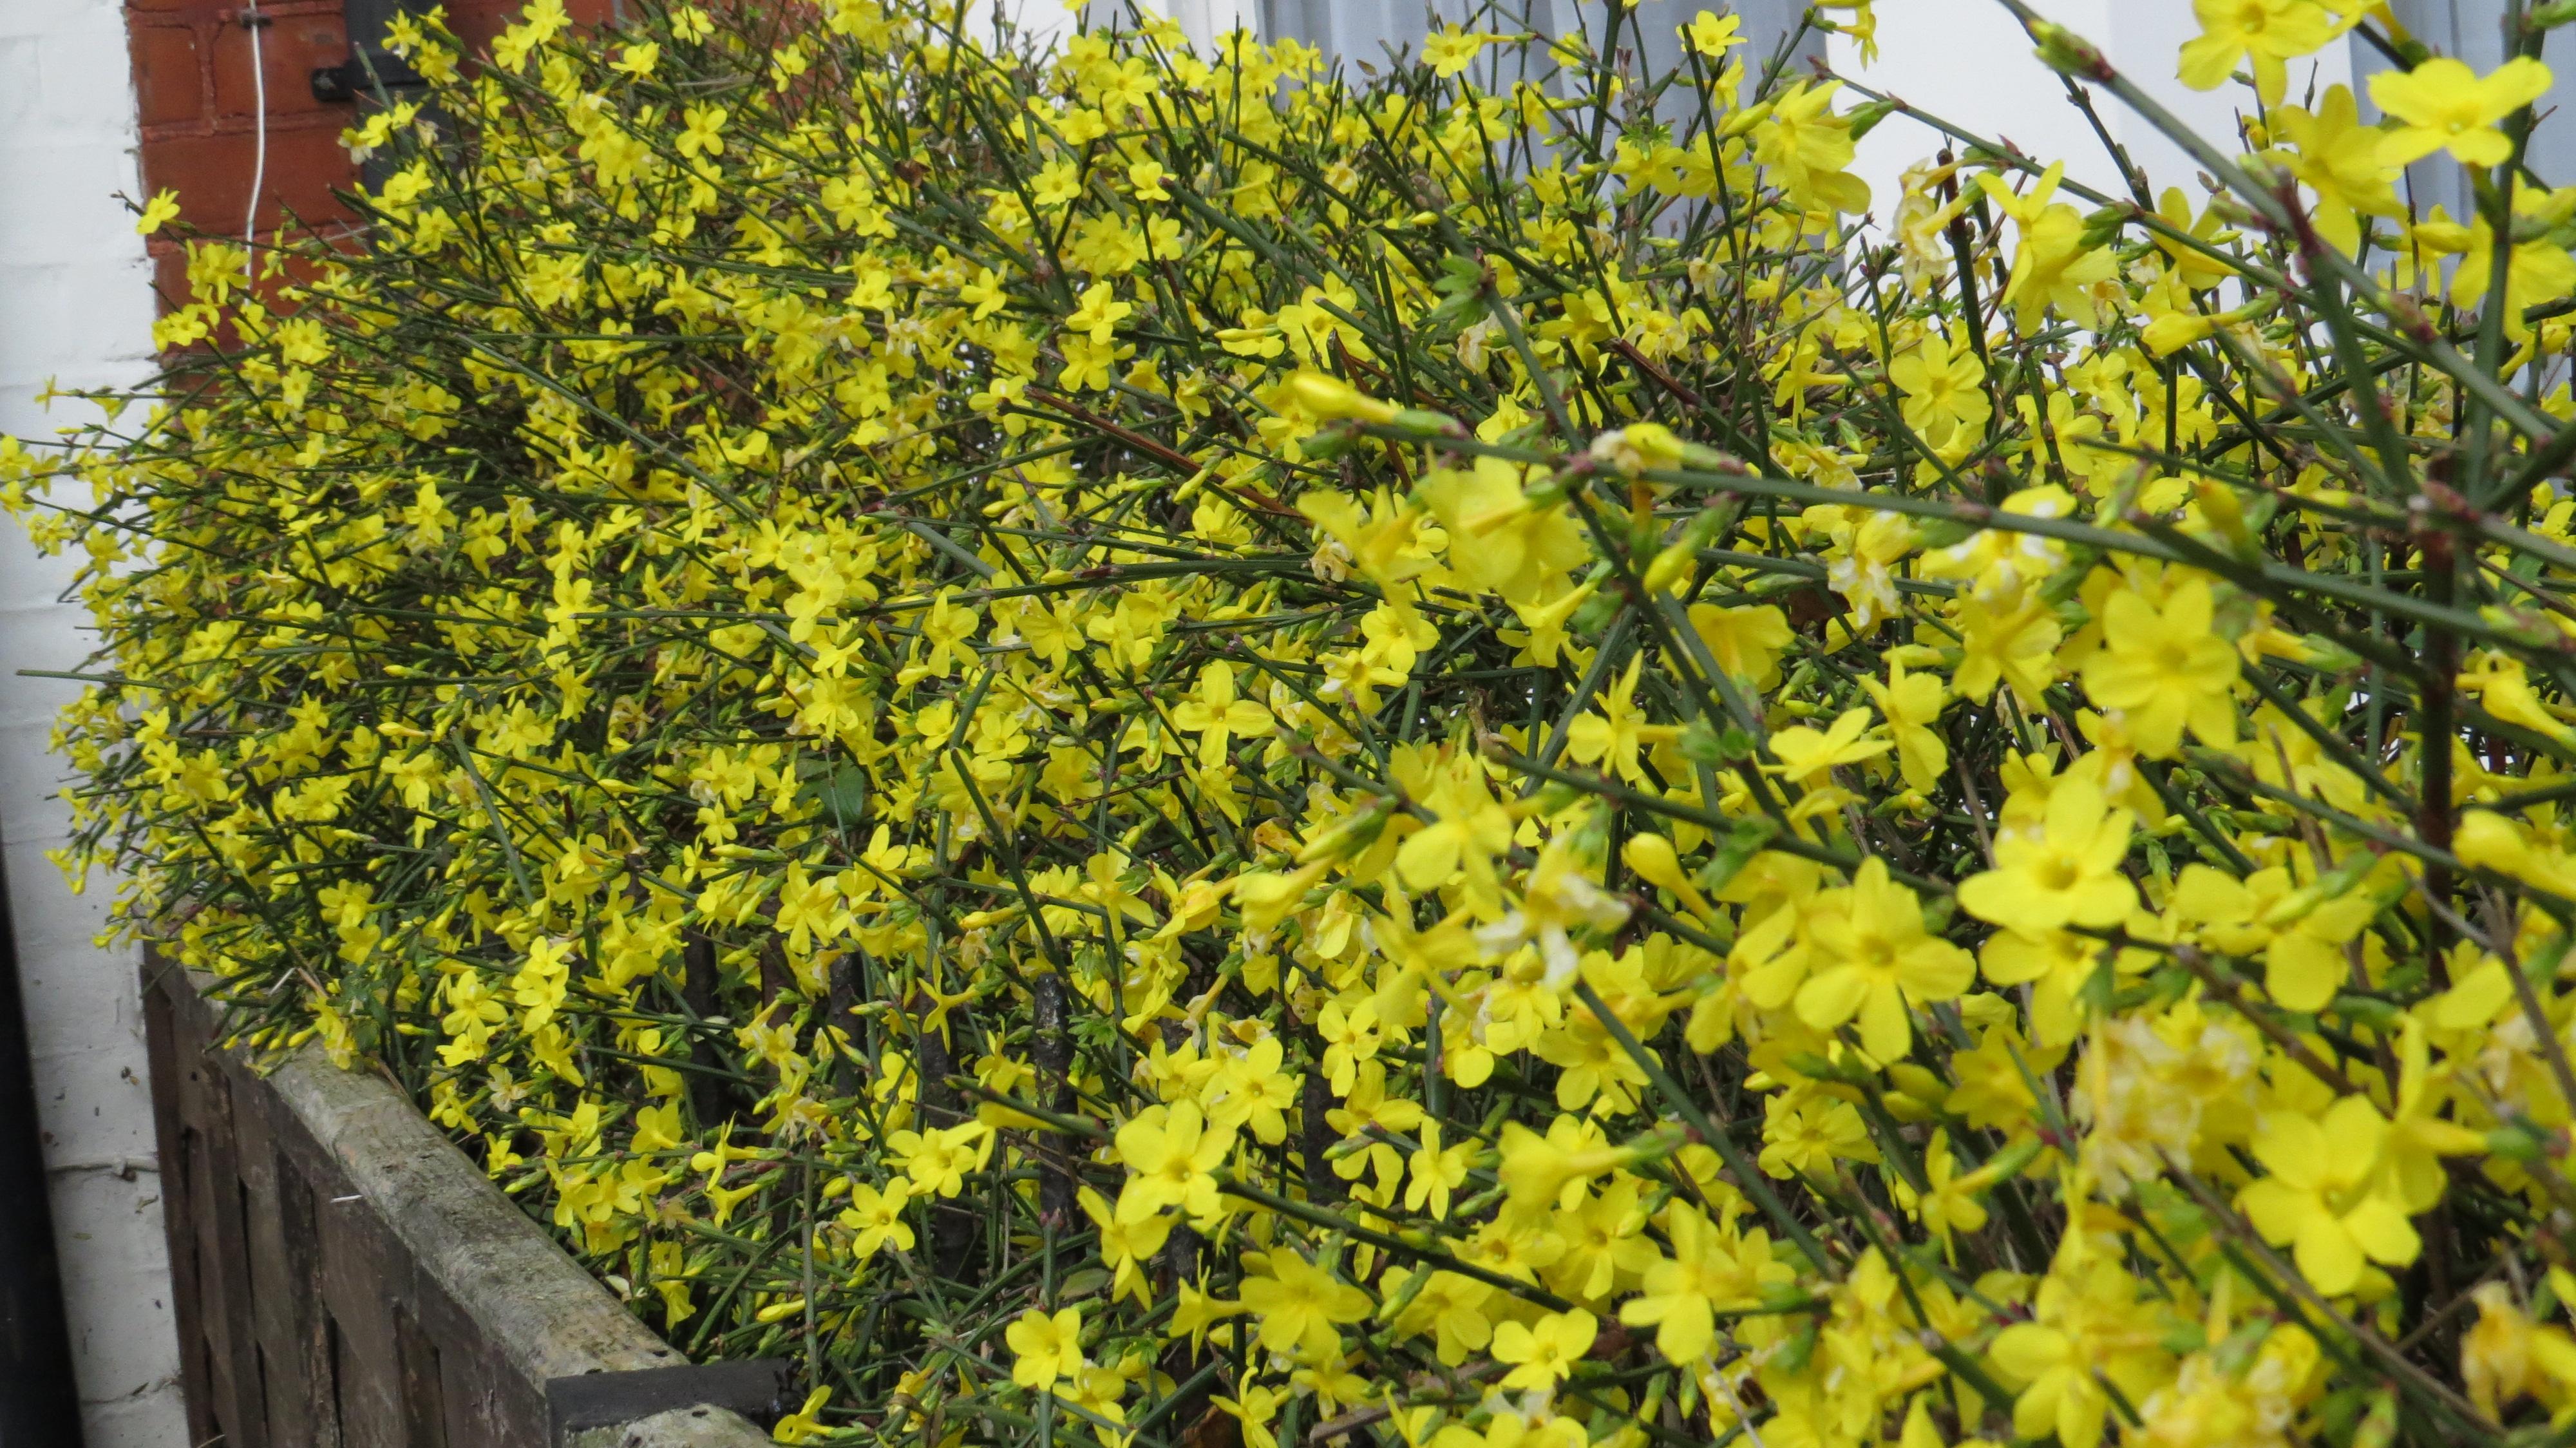 wednesday weed winter jasmine bug woman adventures. Black Bedroom Furniture Sets. Home Design Ideas